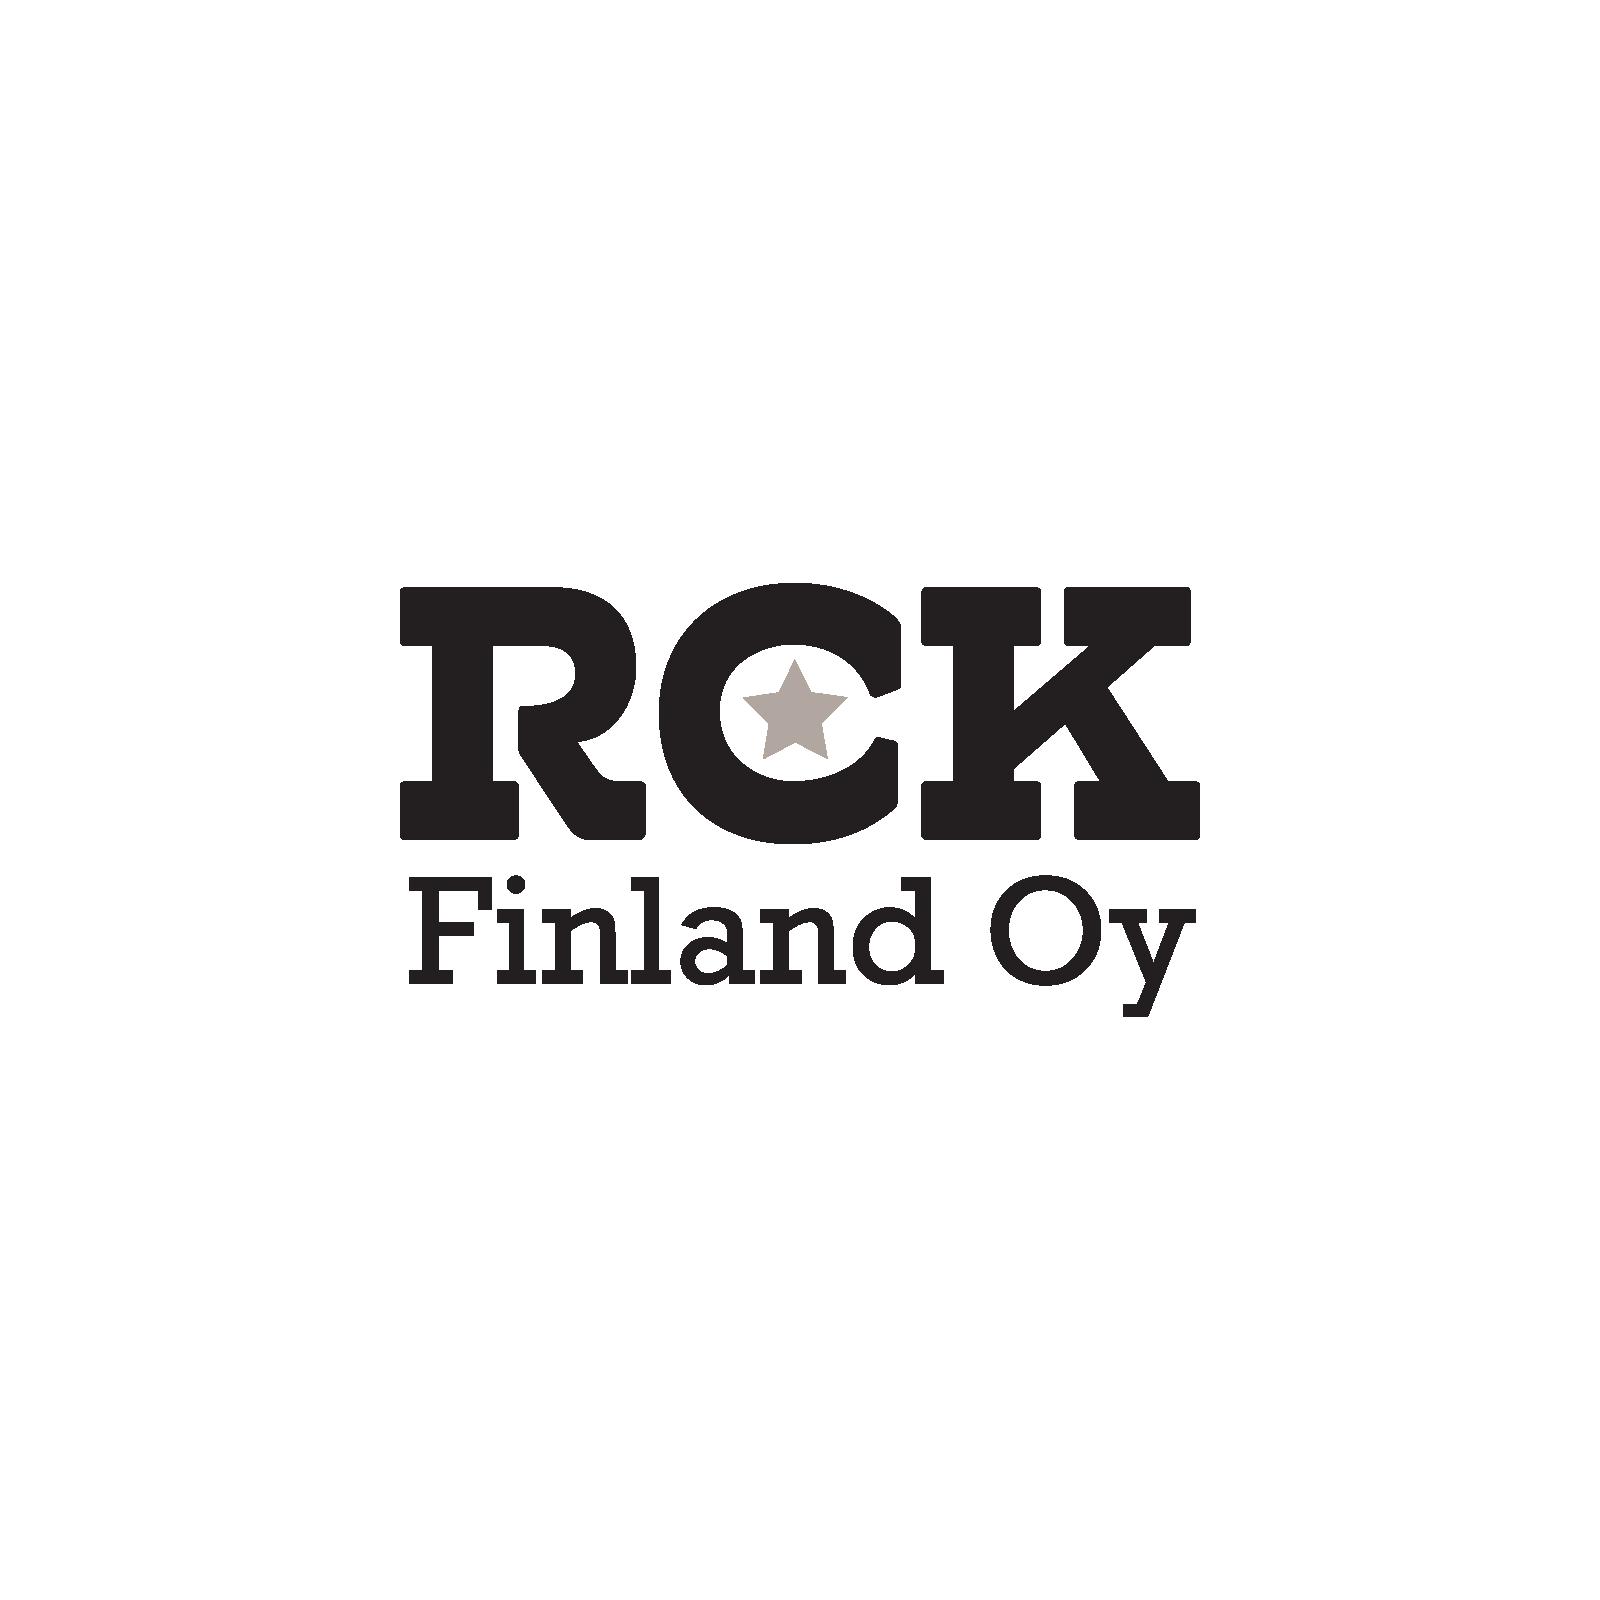 Tulostin 3D tulostin 3.0 EU X